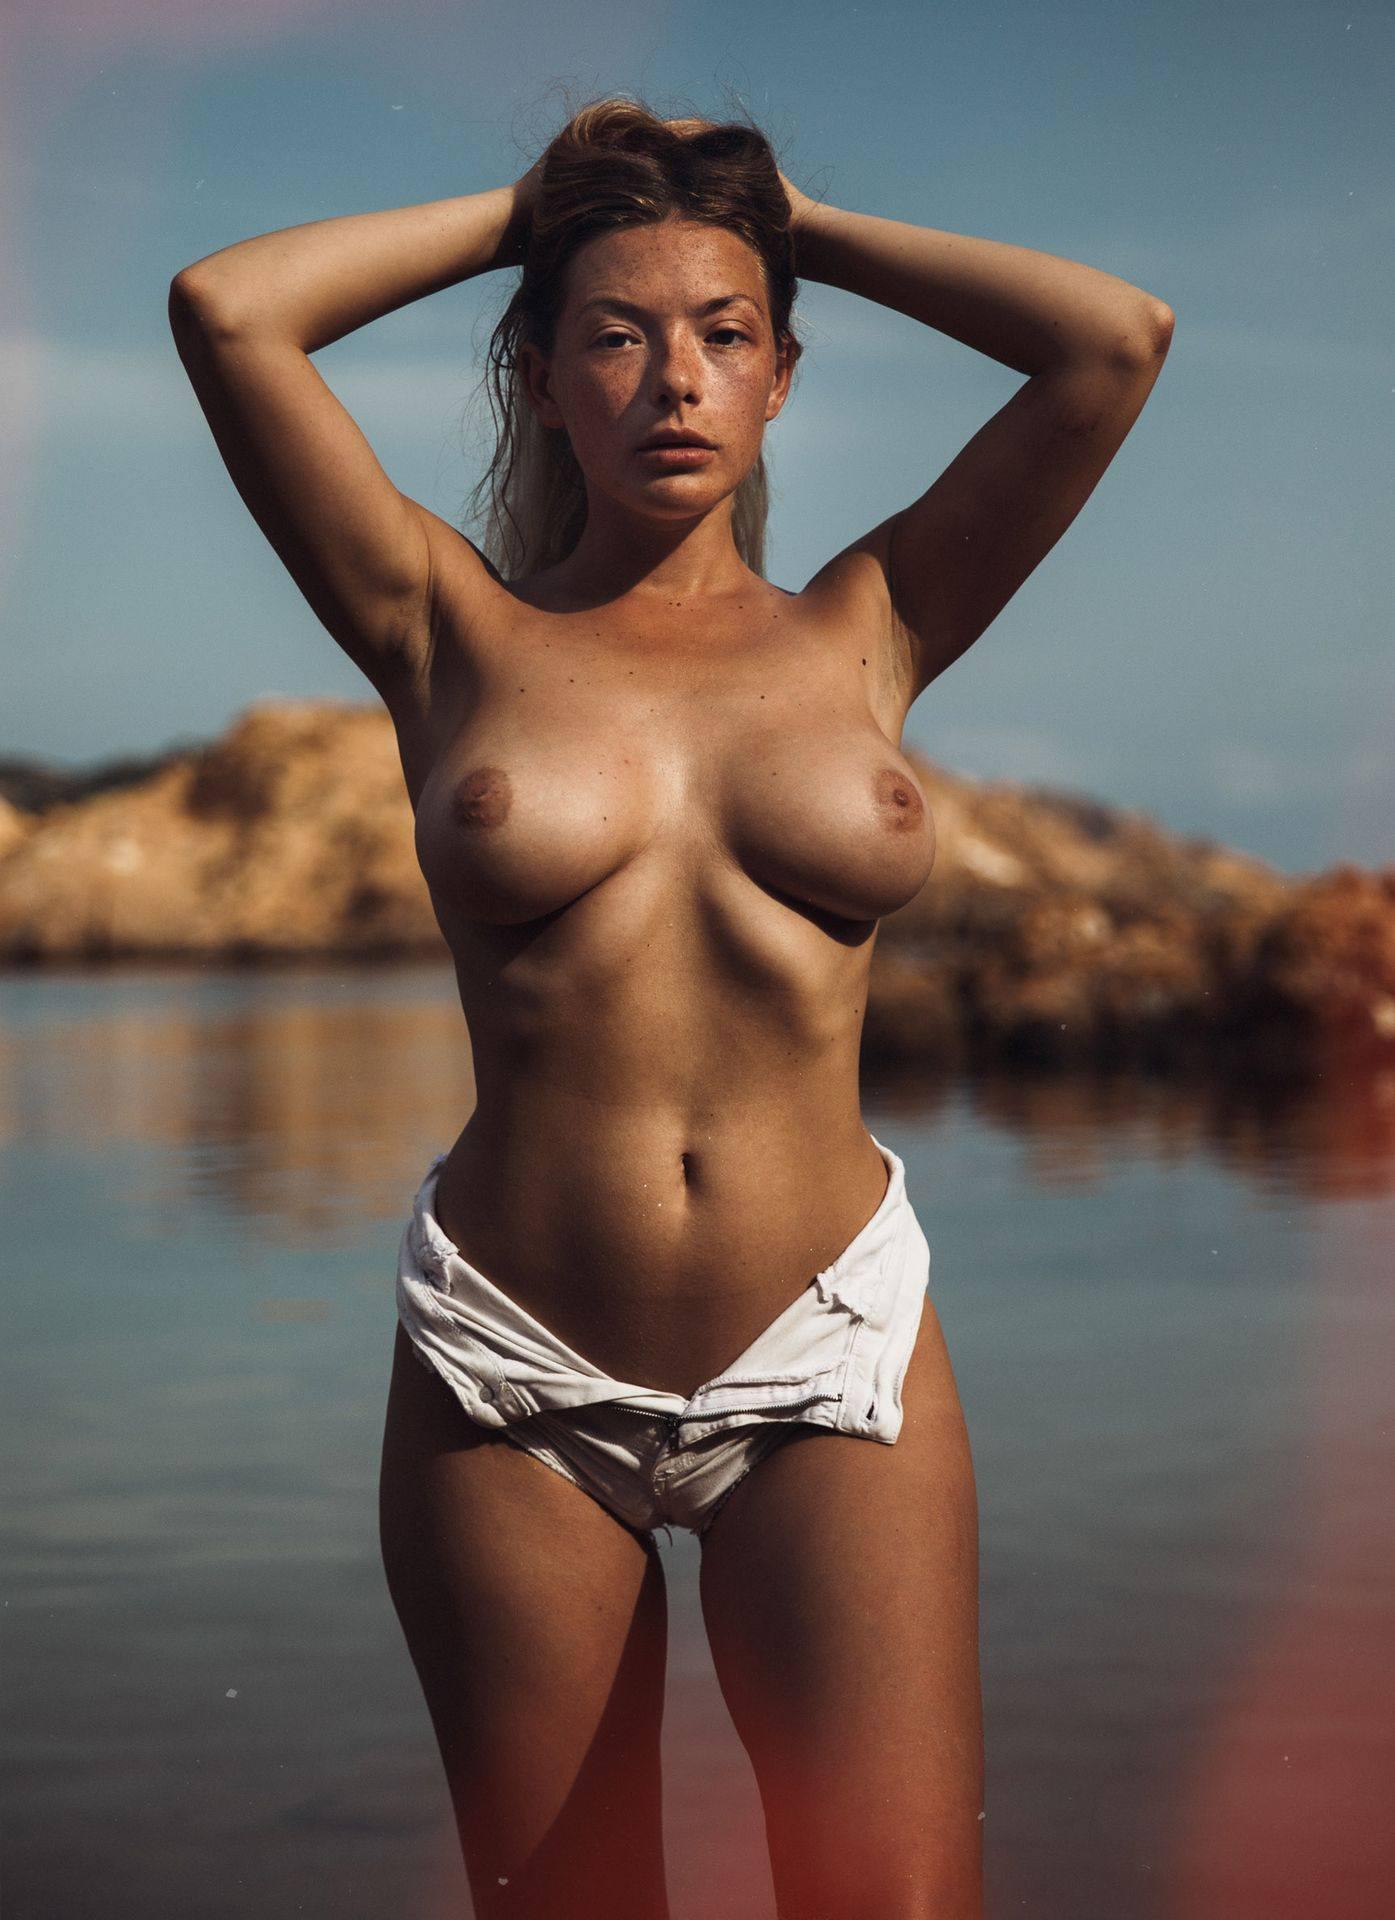 Olga Kobzar – Hot Big Boobs In Sexy Full Frontal Nude Photoshoot By Thomas Agatz (nsfw) 0017